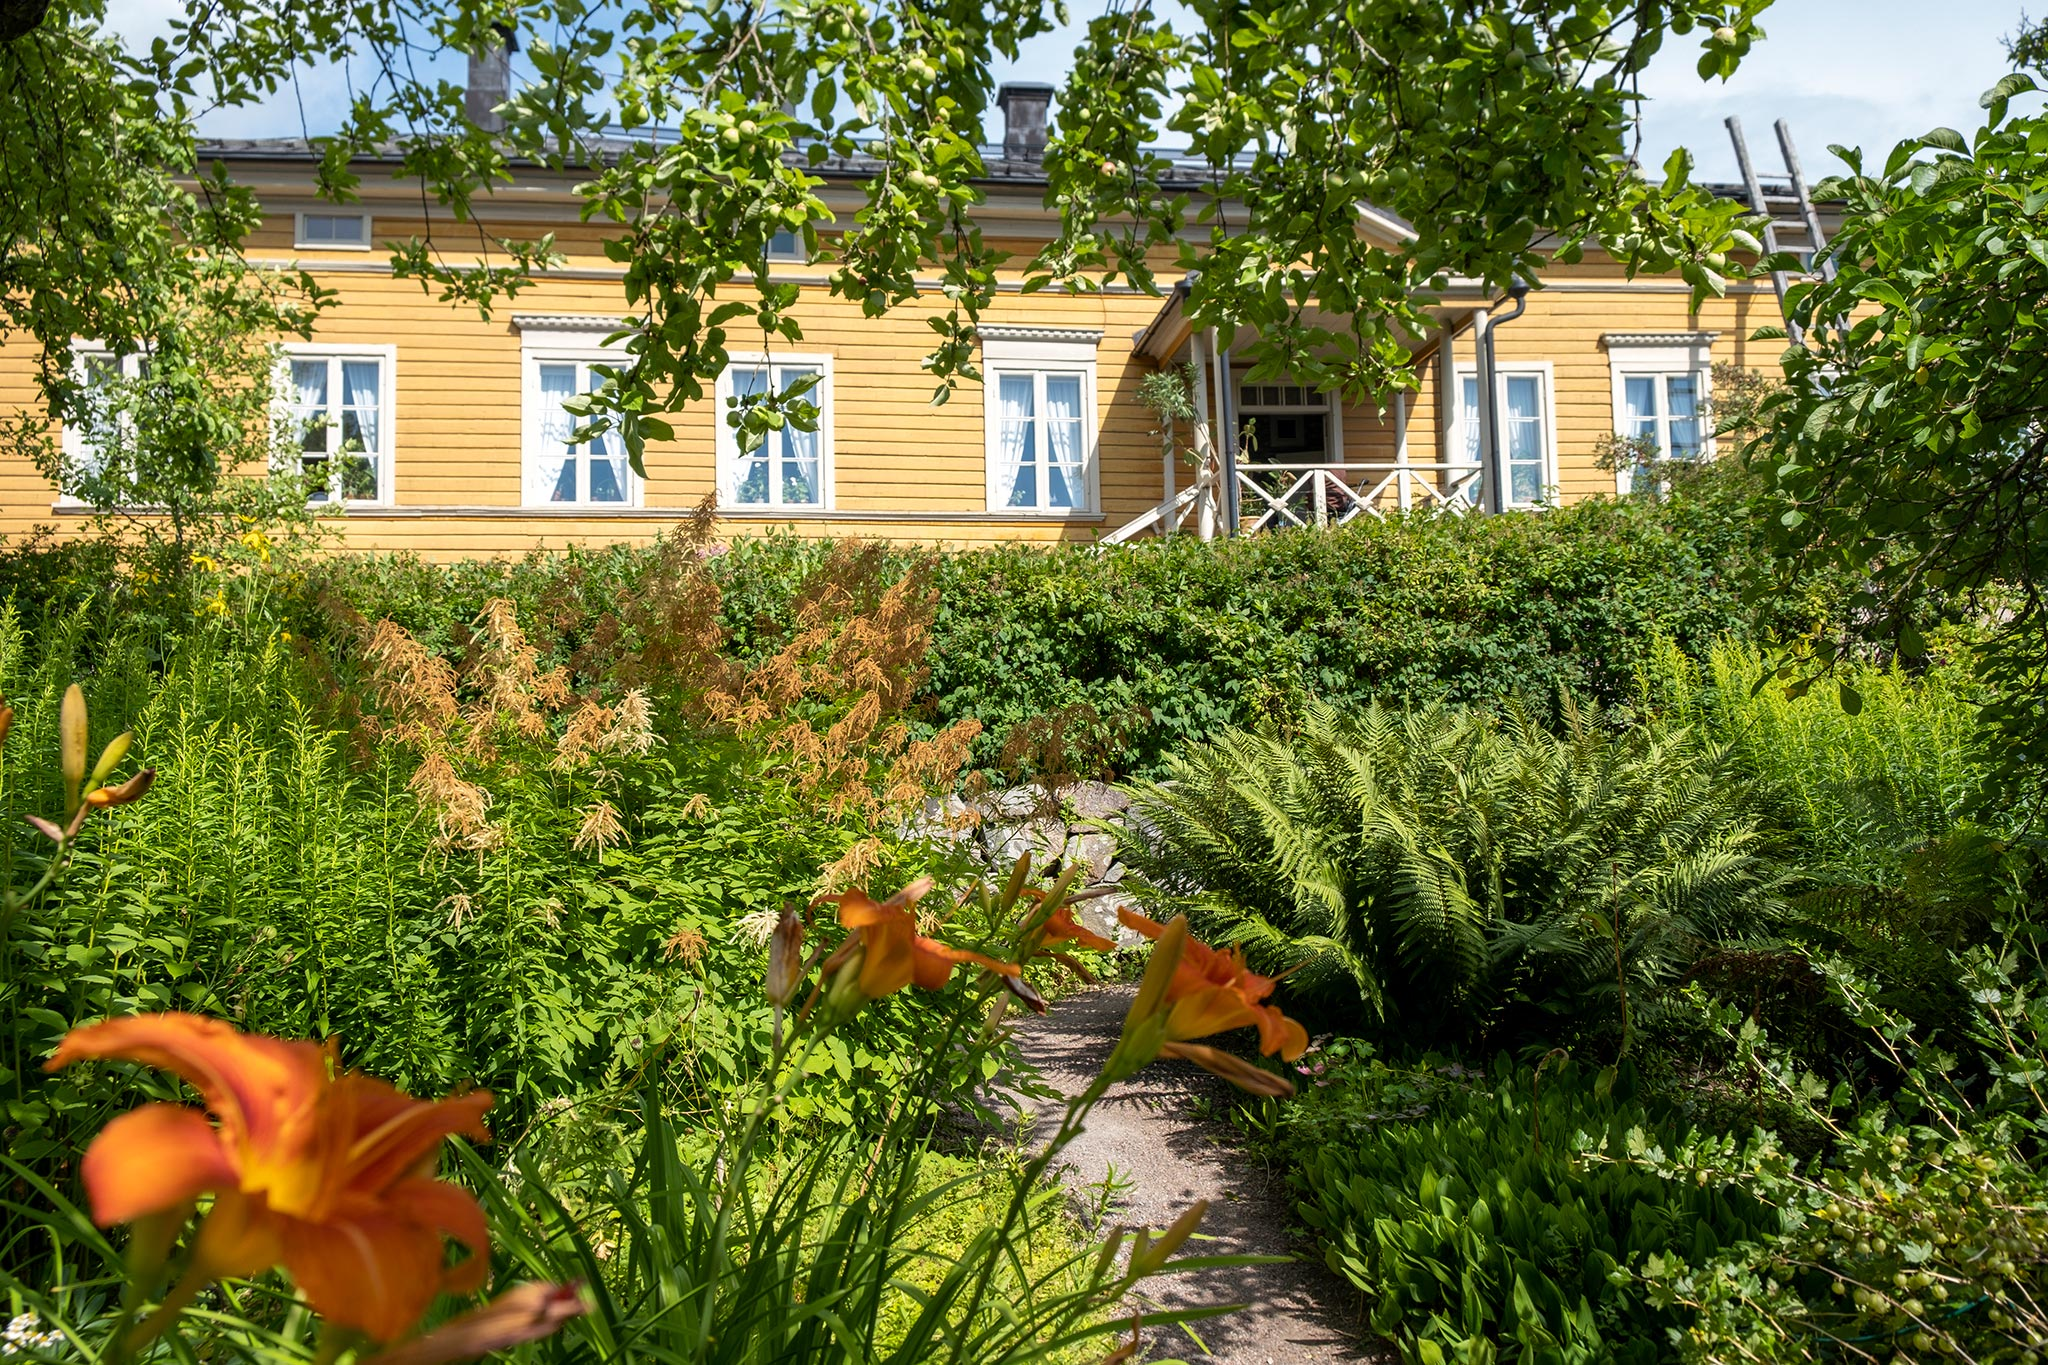 Runebergin kotimuseo © Tuulia Kolehmainen